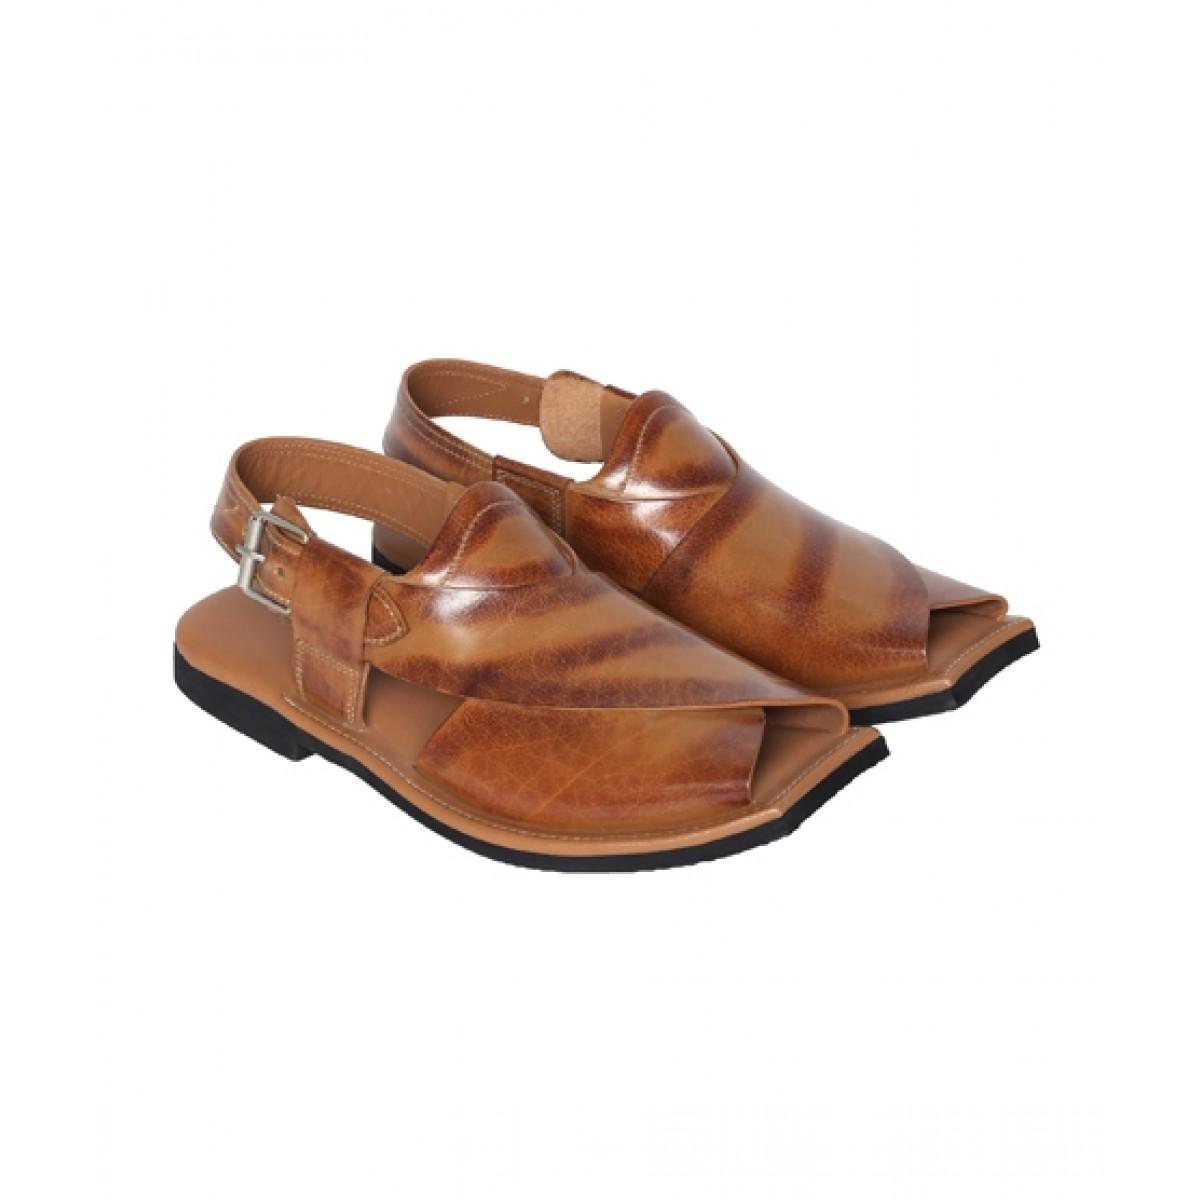 NOVADO Ajab Khan Leather Peshawari Sandal For Men Tan (0047)